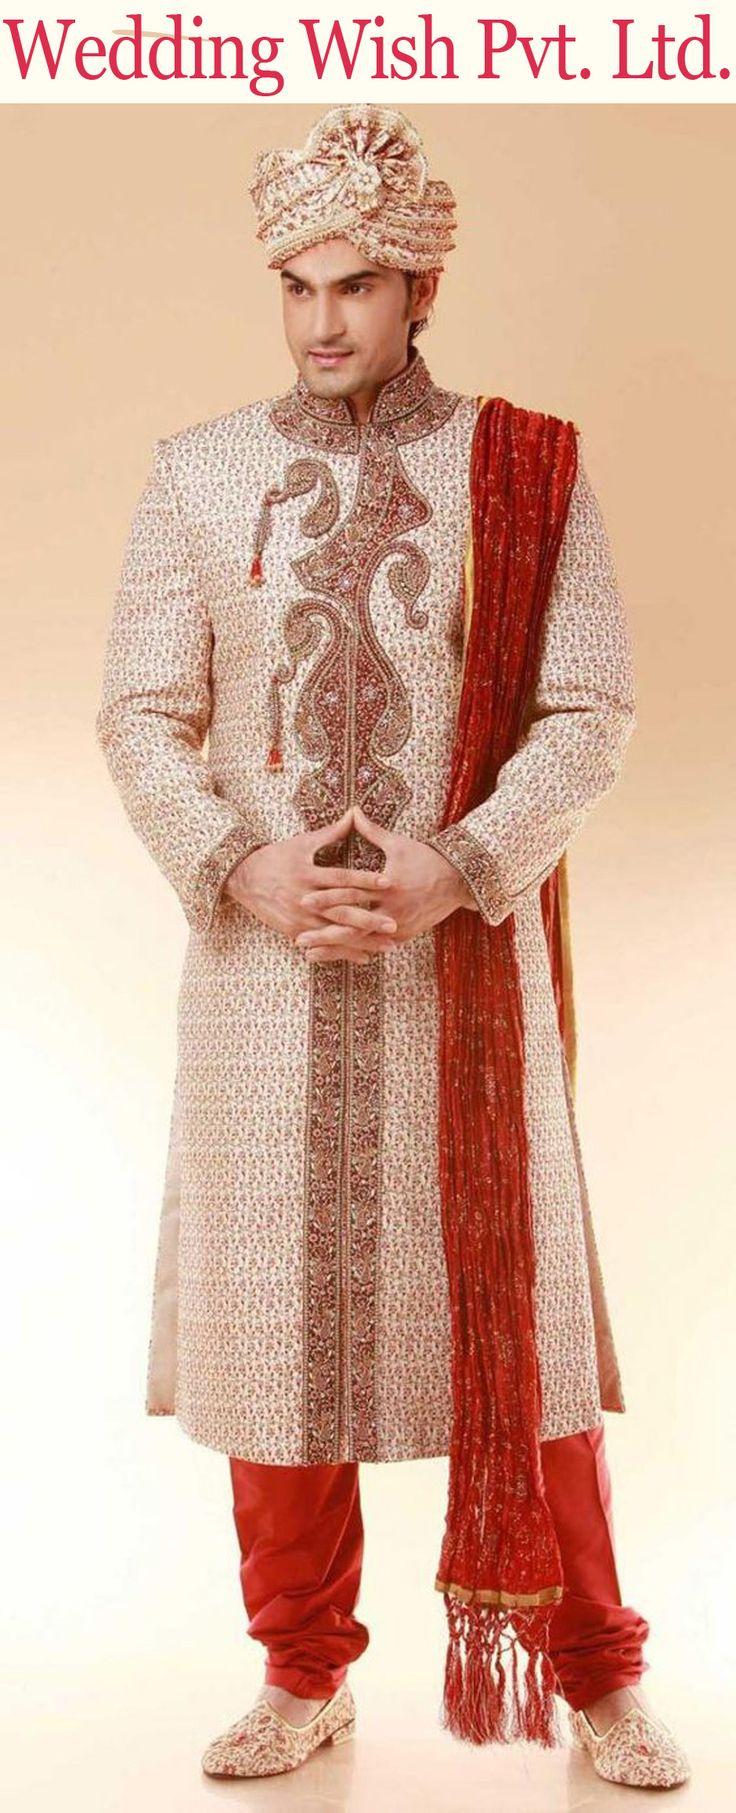 7 best wedding groom dress images on Pinterest | Indian weddings ...